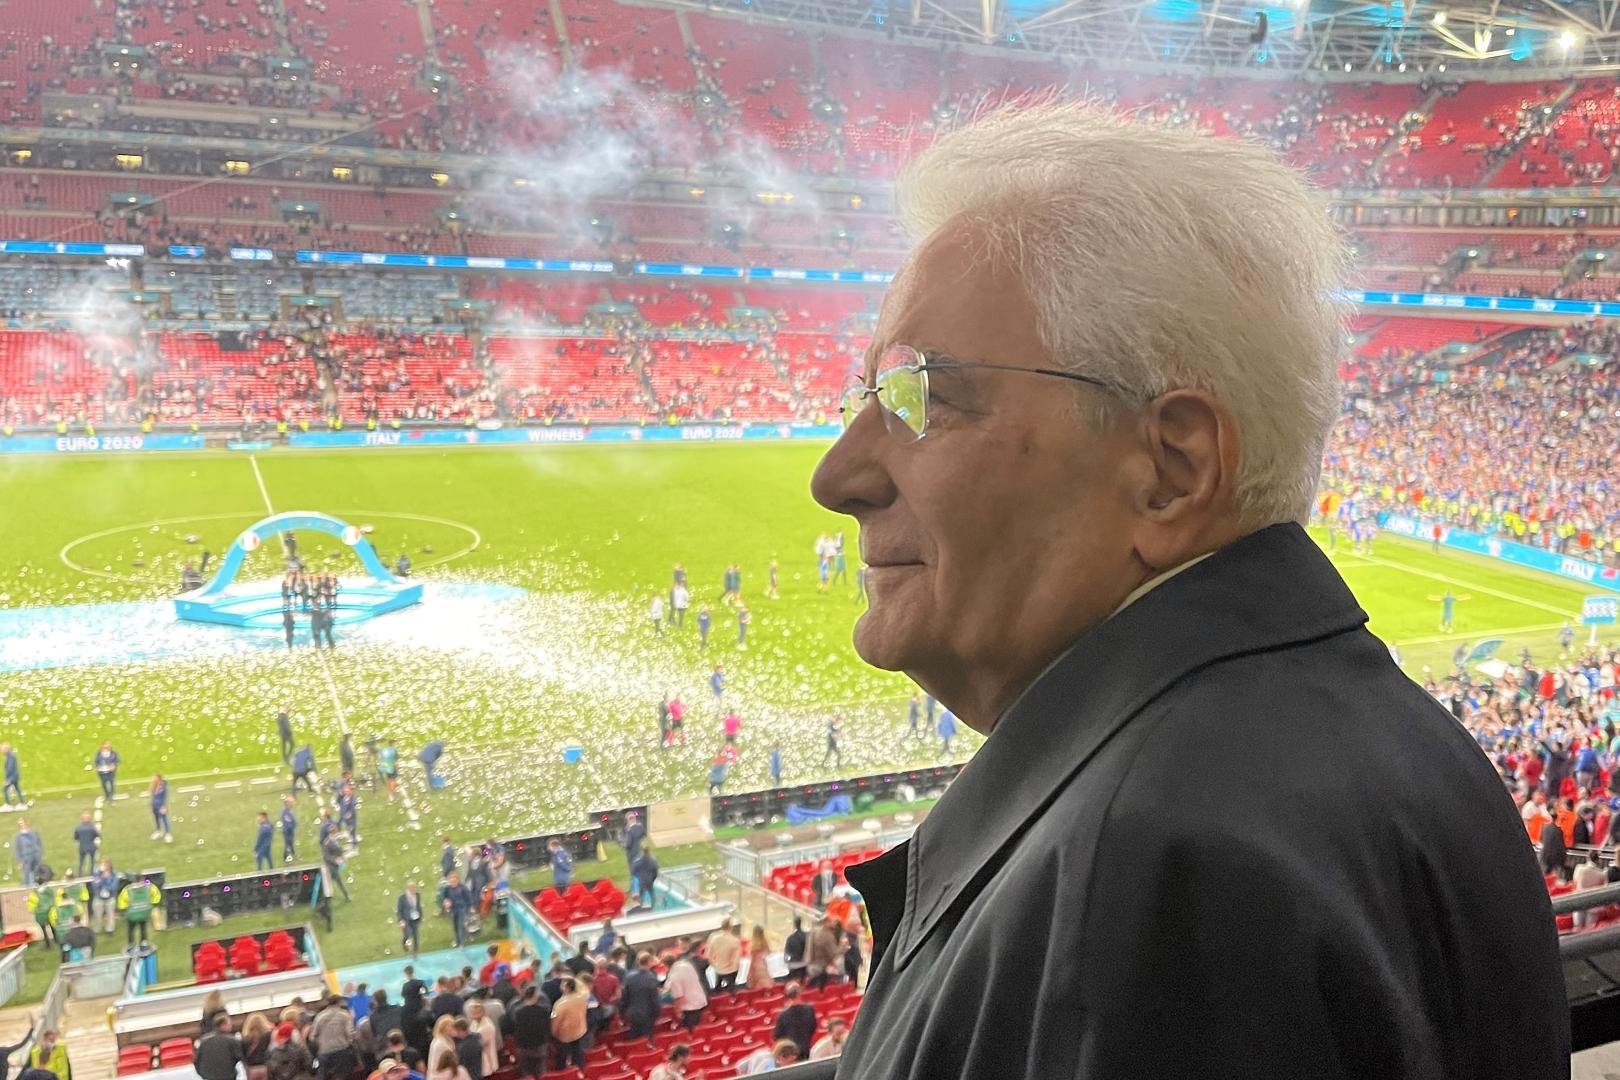 21 SPORT Euro 2020 - mattarella Wembley